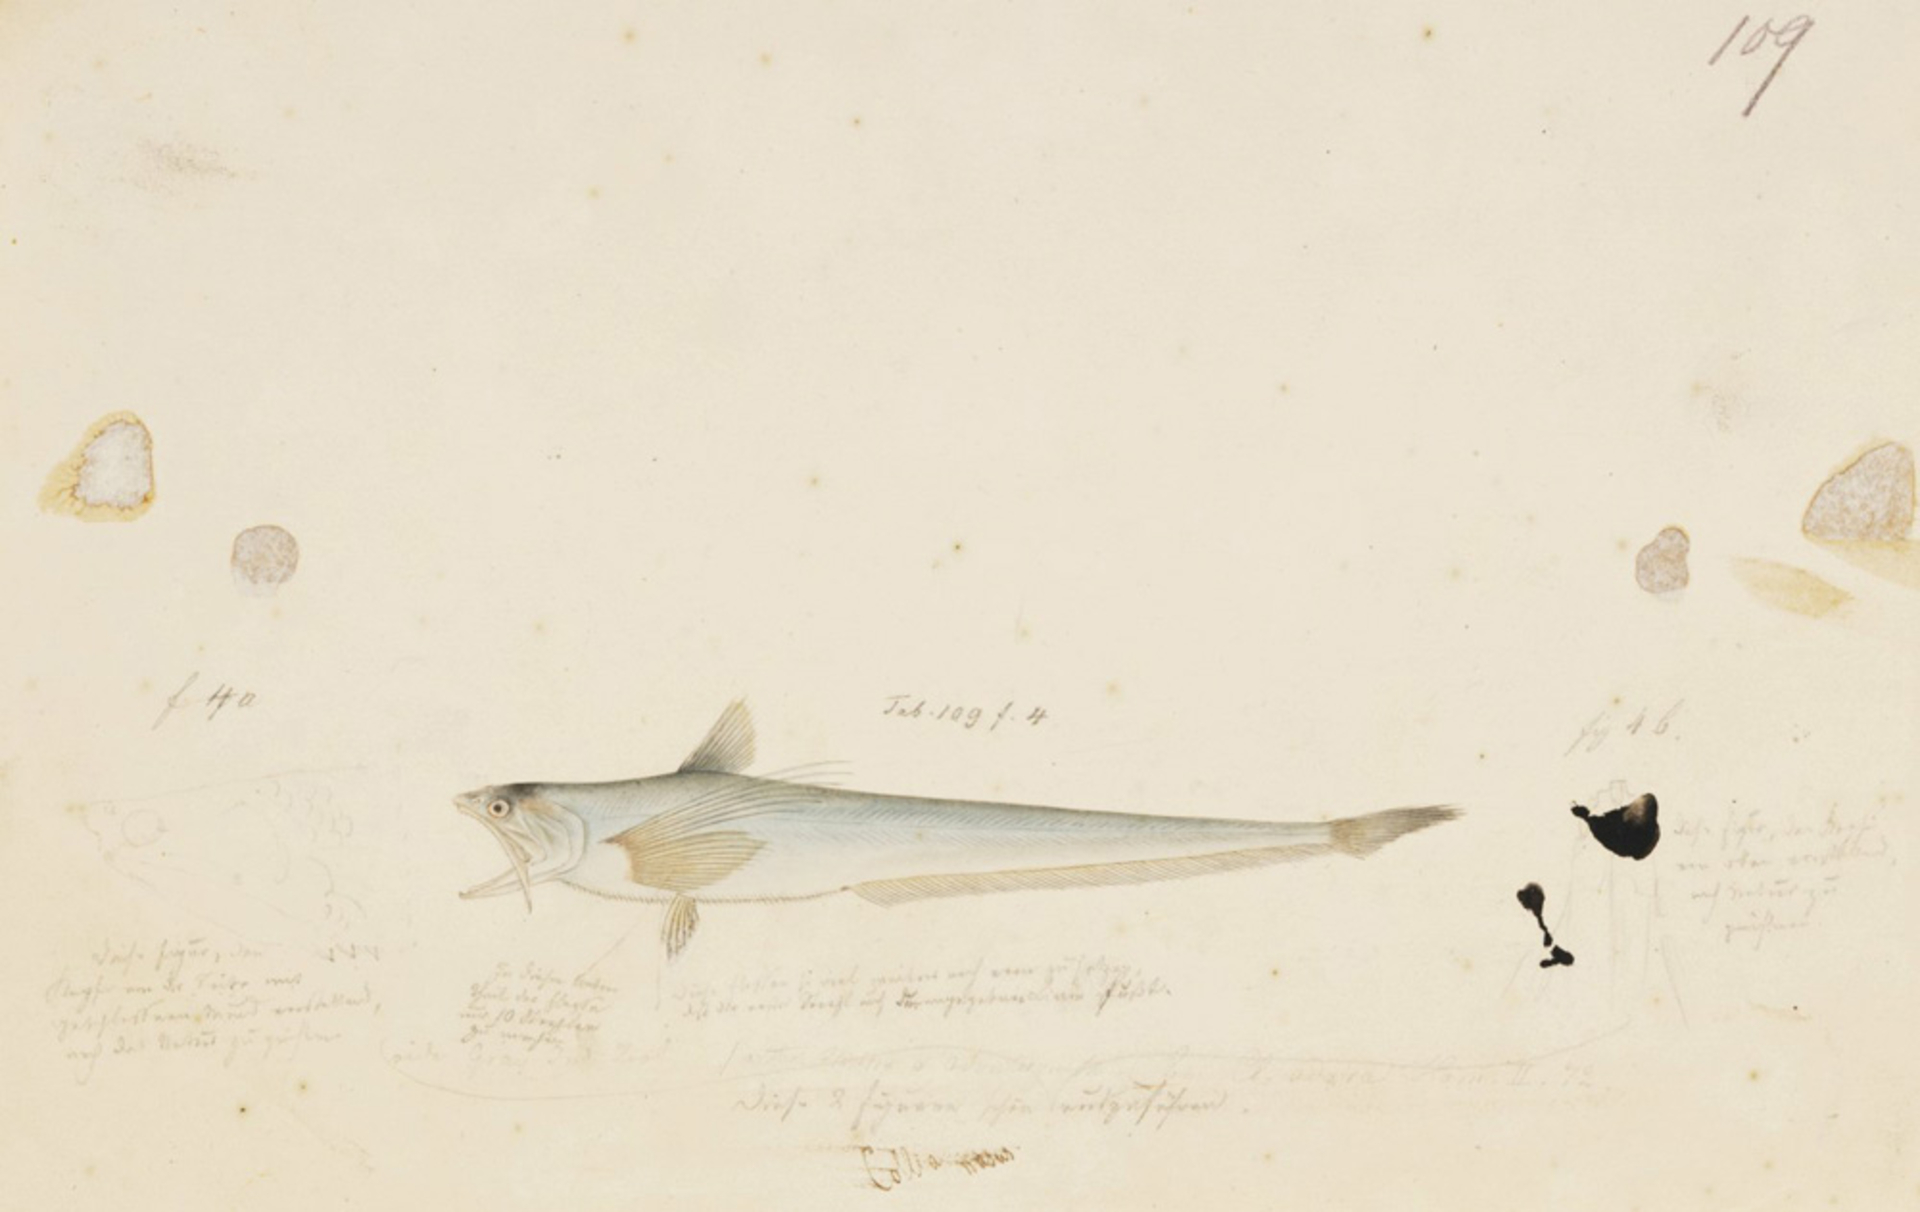 RMNH.ART.153 | Coilia nasus